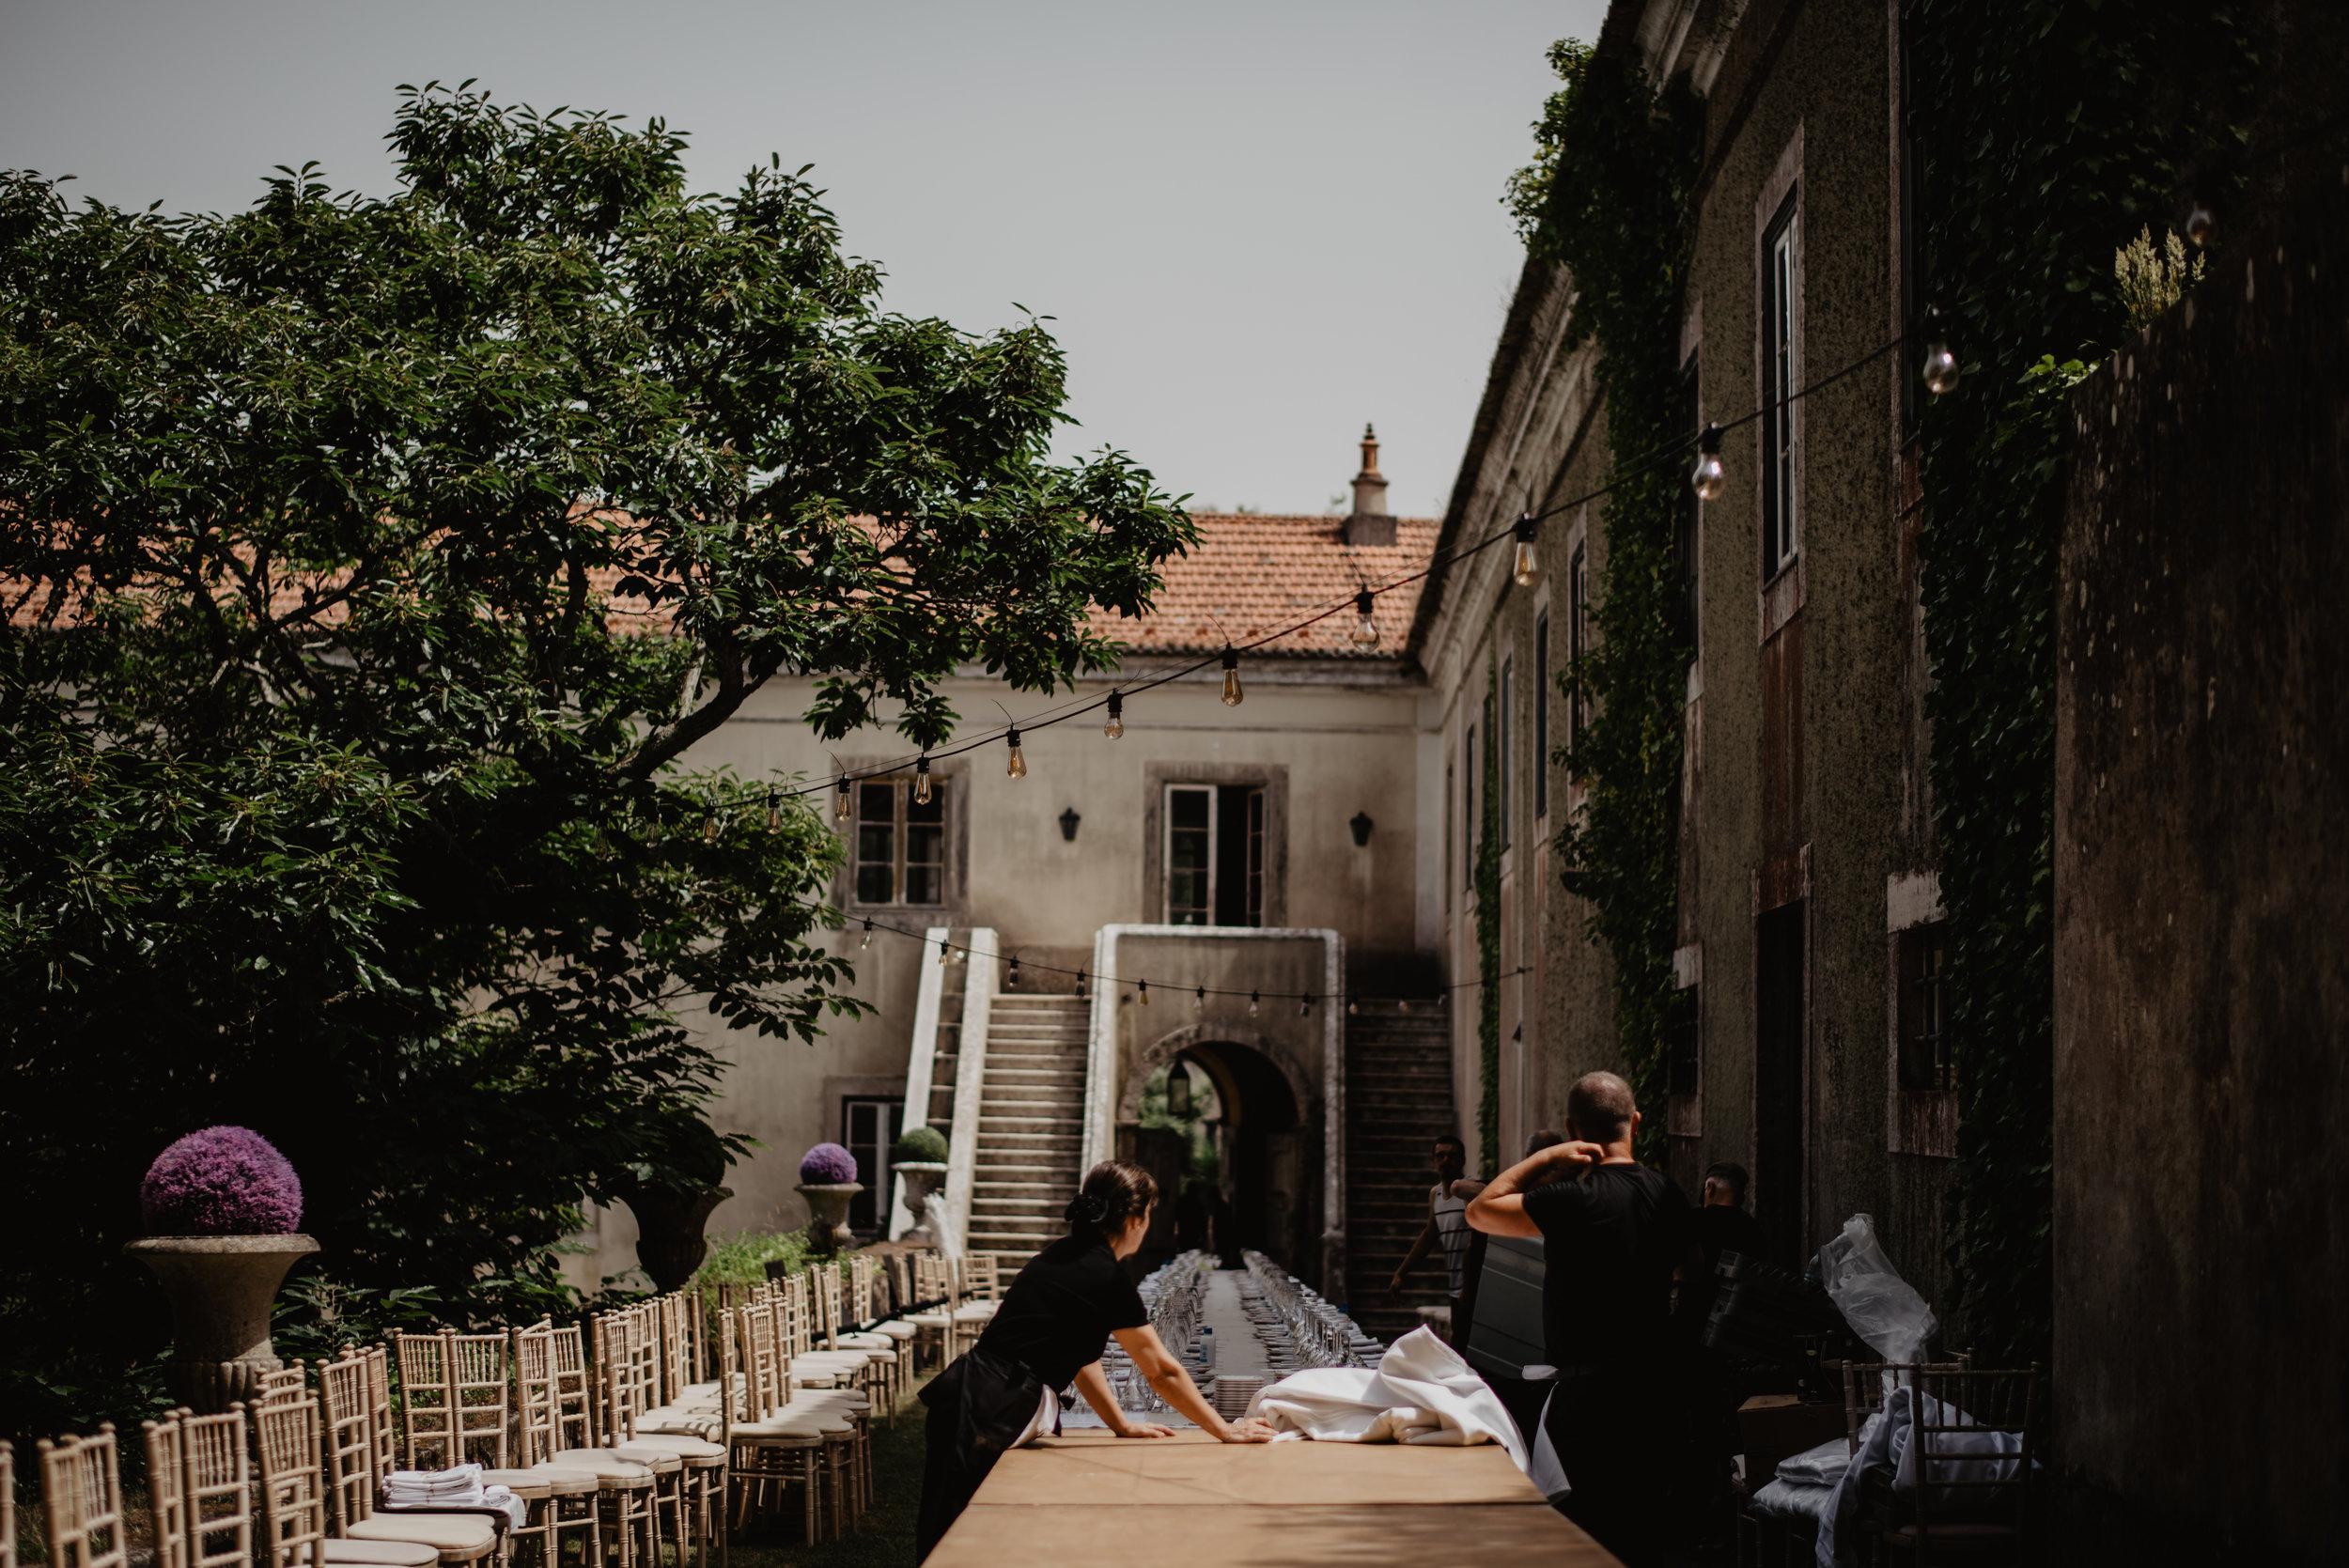 Lapela-photography-wedding-sintra-portugal-13.jpg